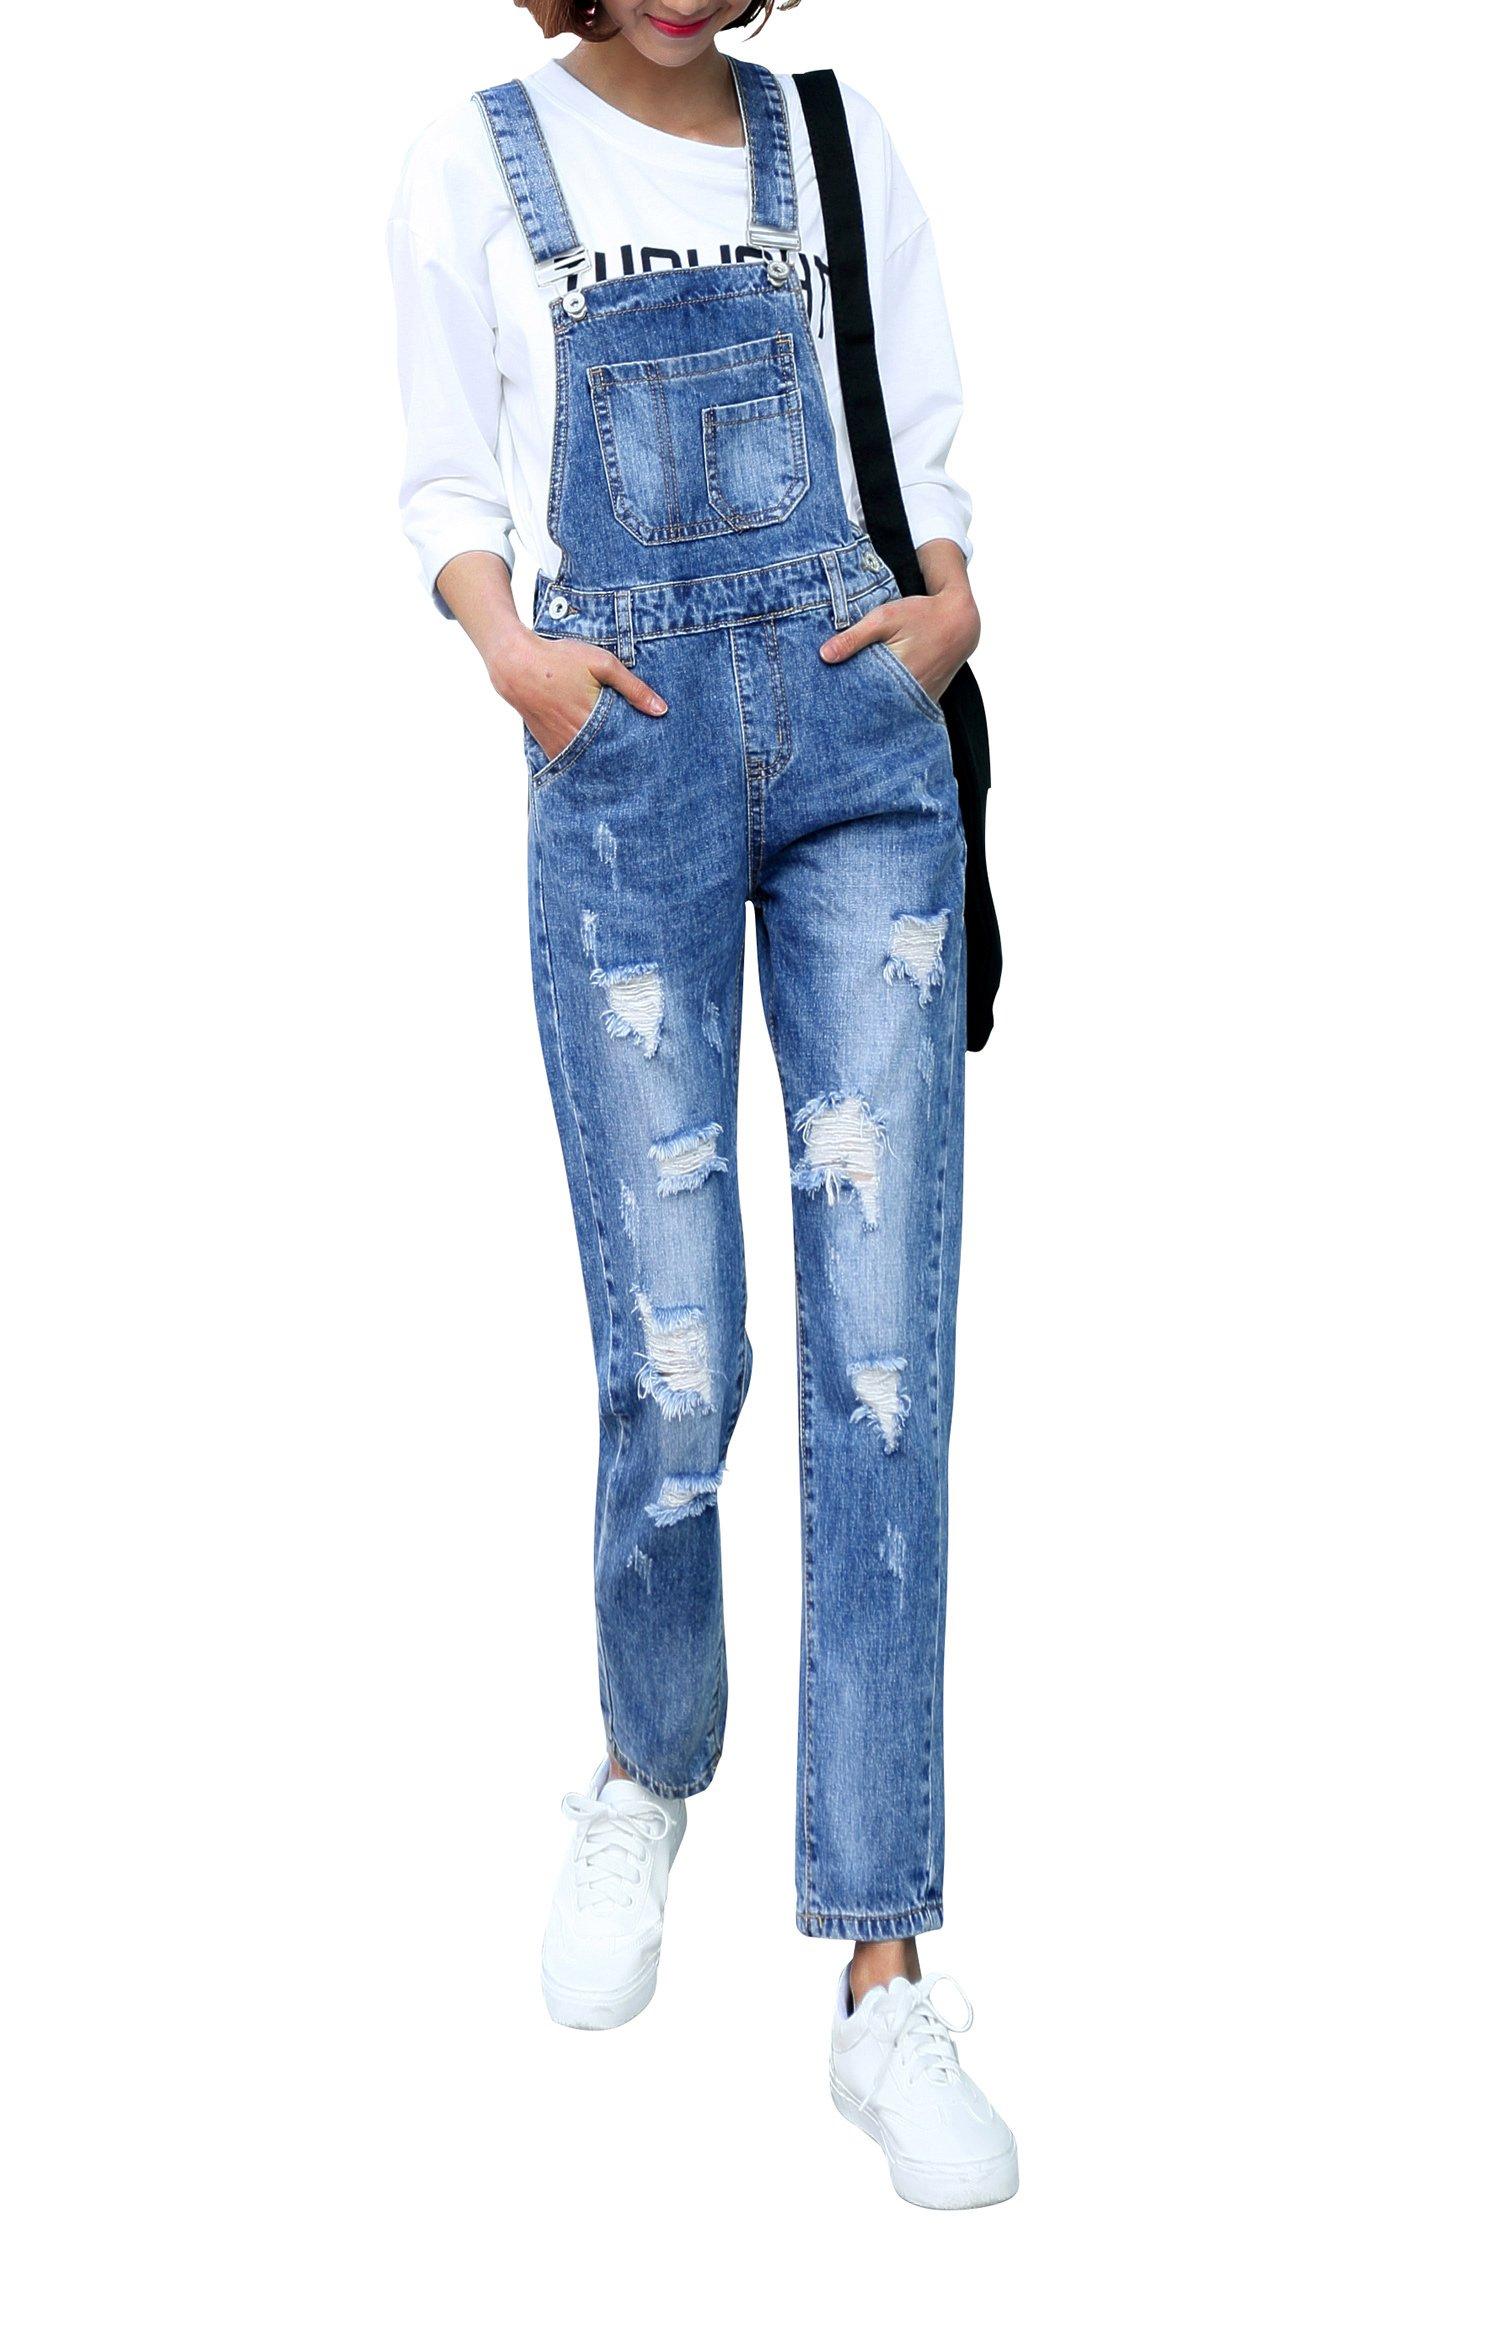 c6980af5fb1 Women's Classic Bib Overalls Denim Jeans Adjustable Strap Romper ...